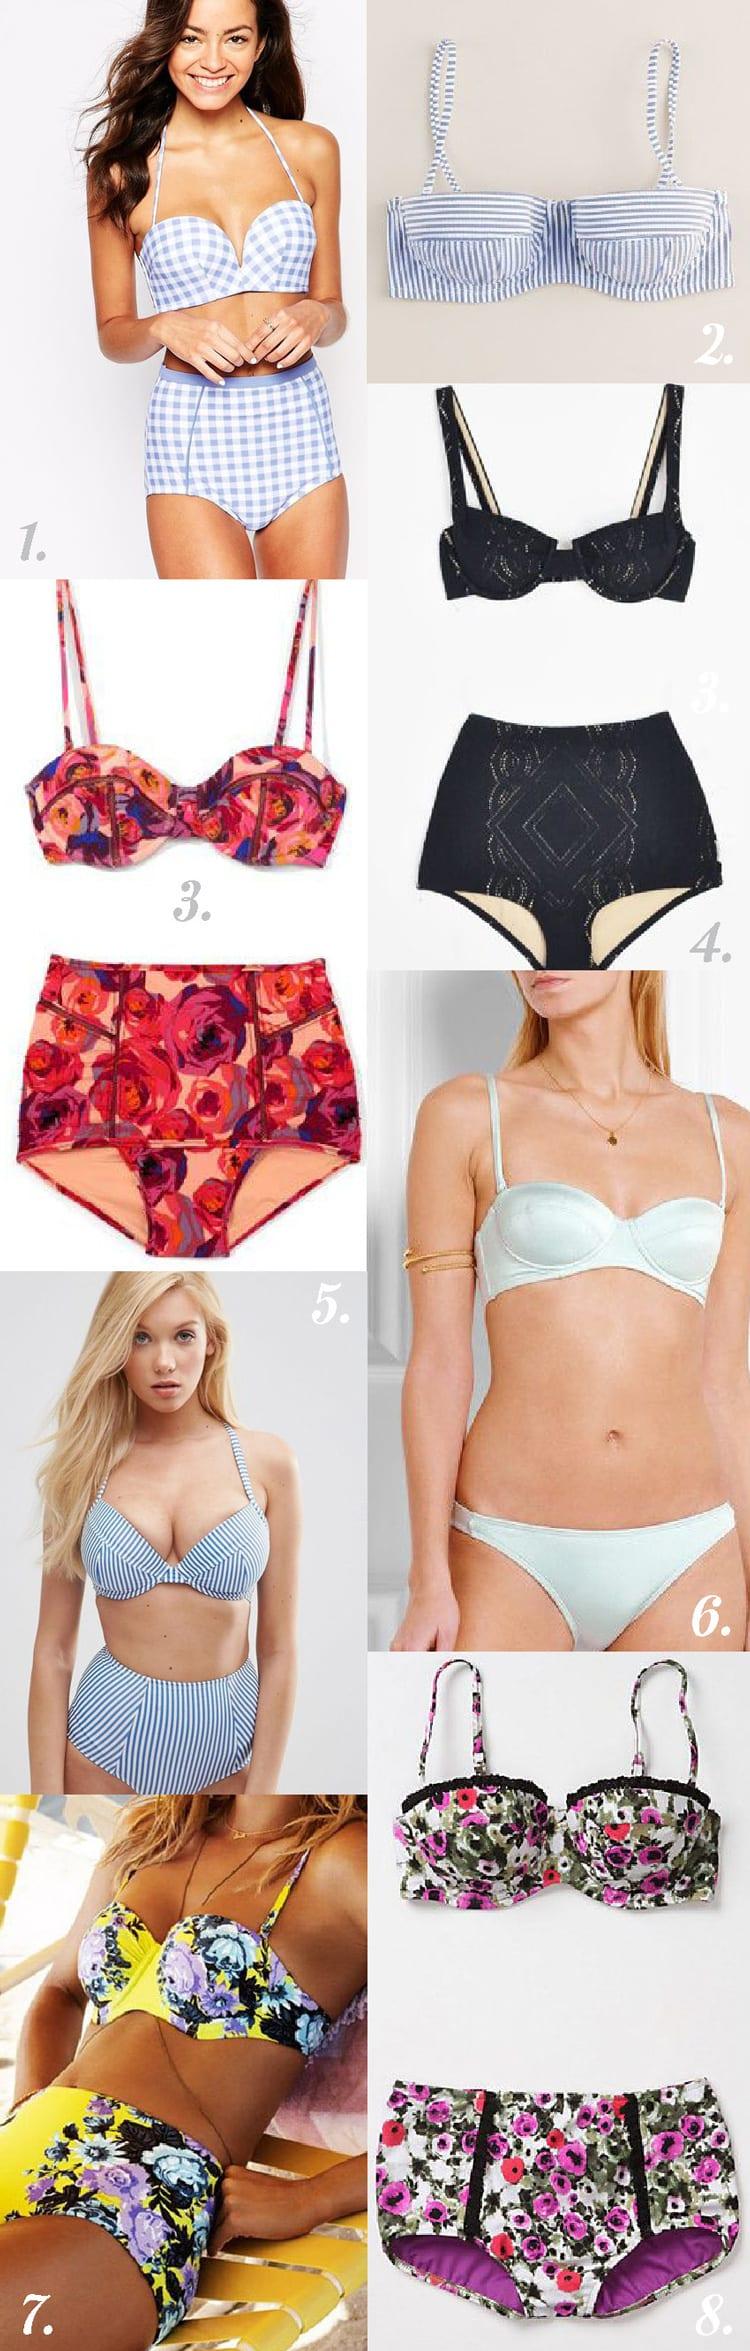 Bikini styling inspiration // Sophie Swimsuit // Closet Case Files